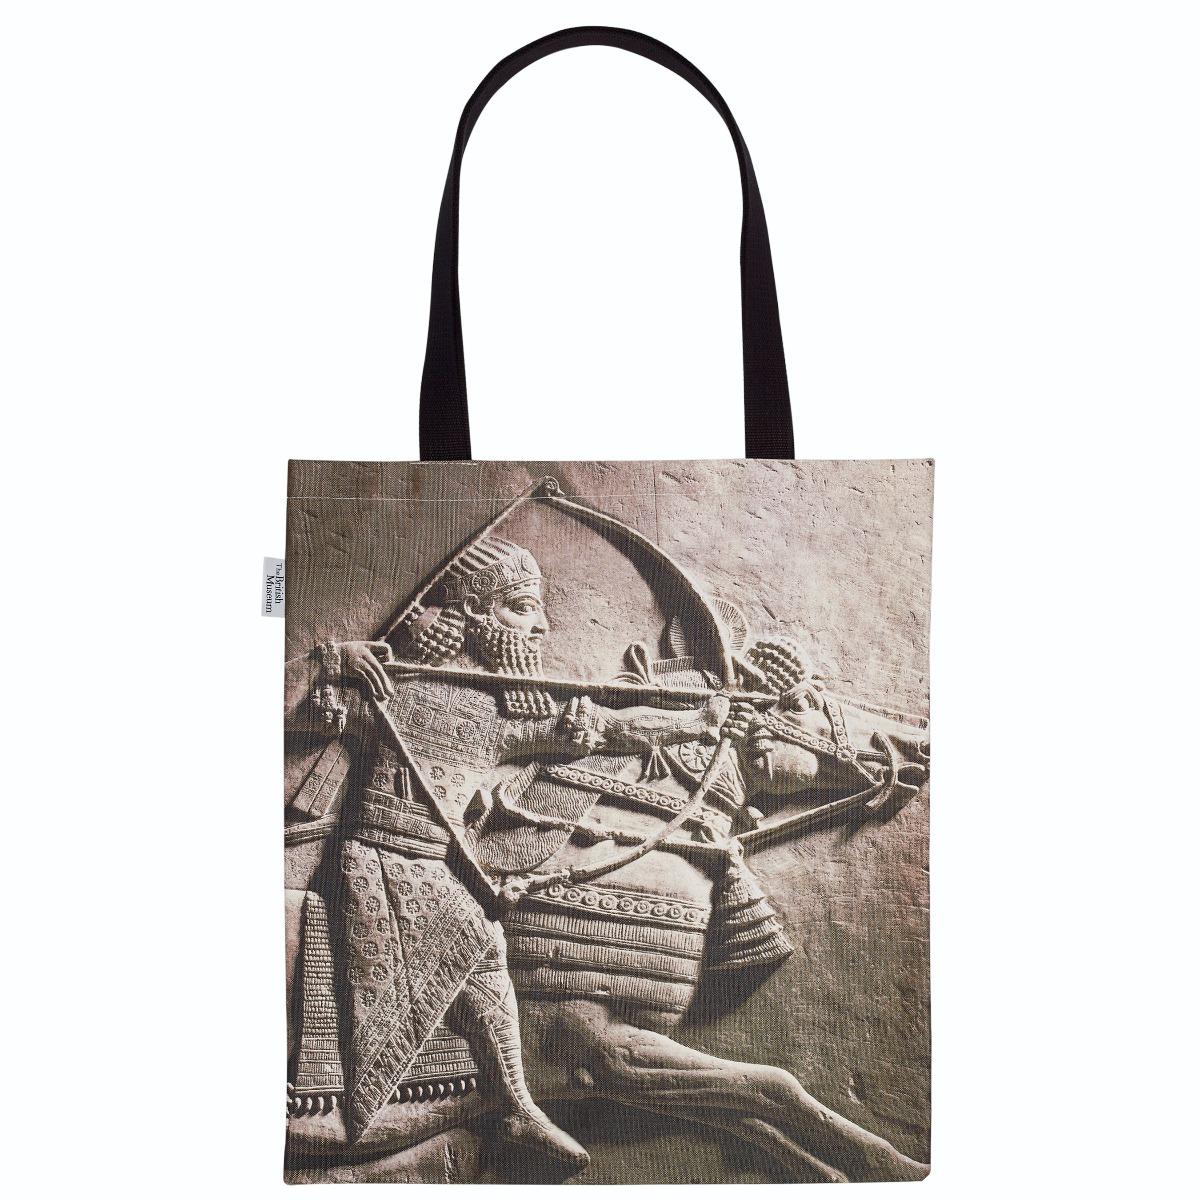 Ashurbanipal totebag